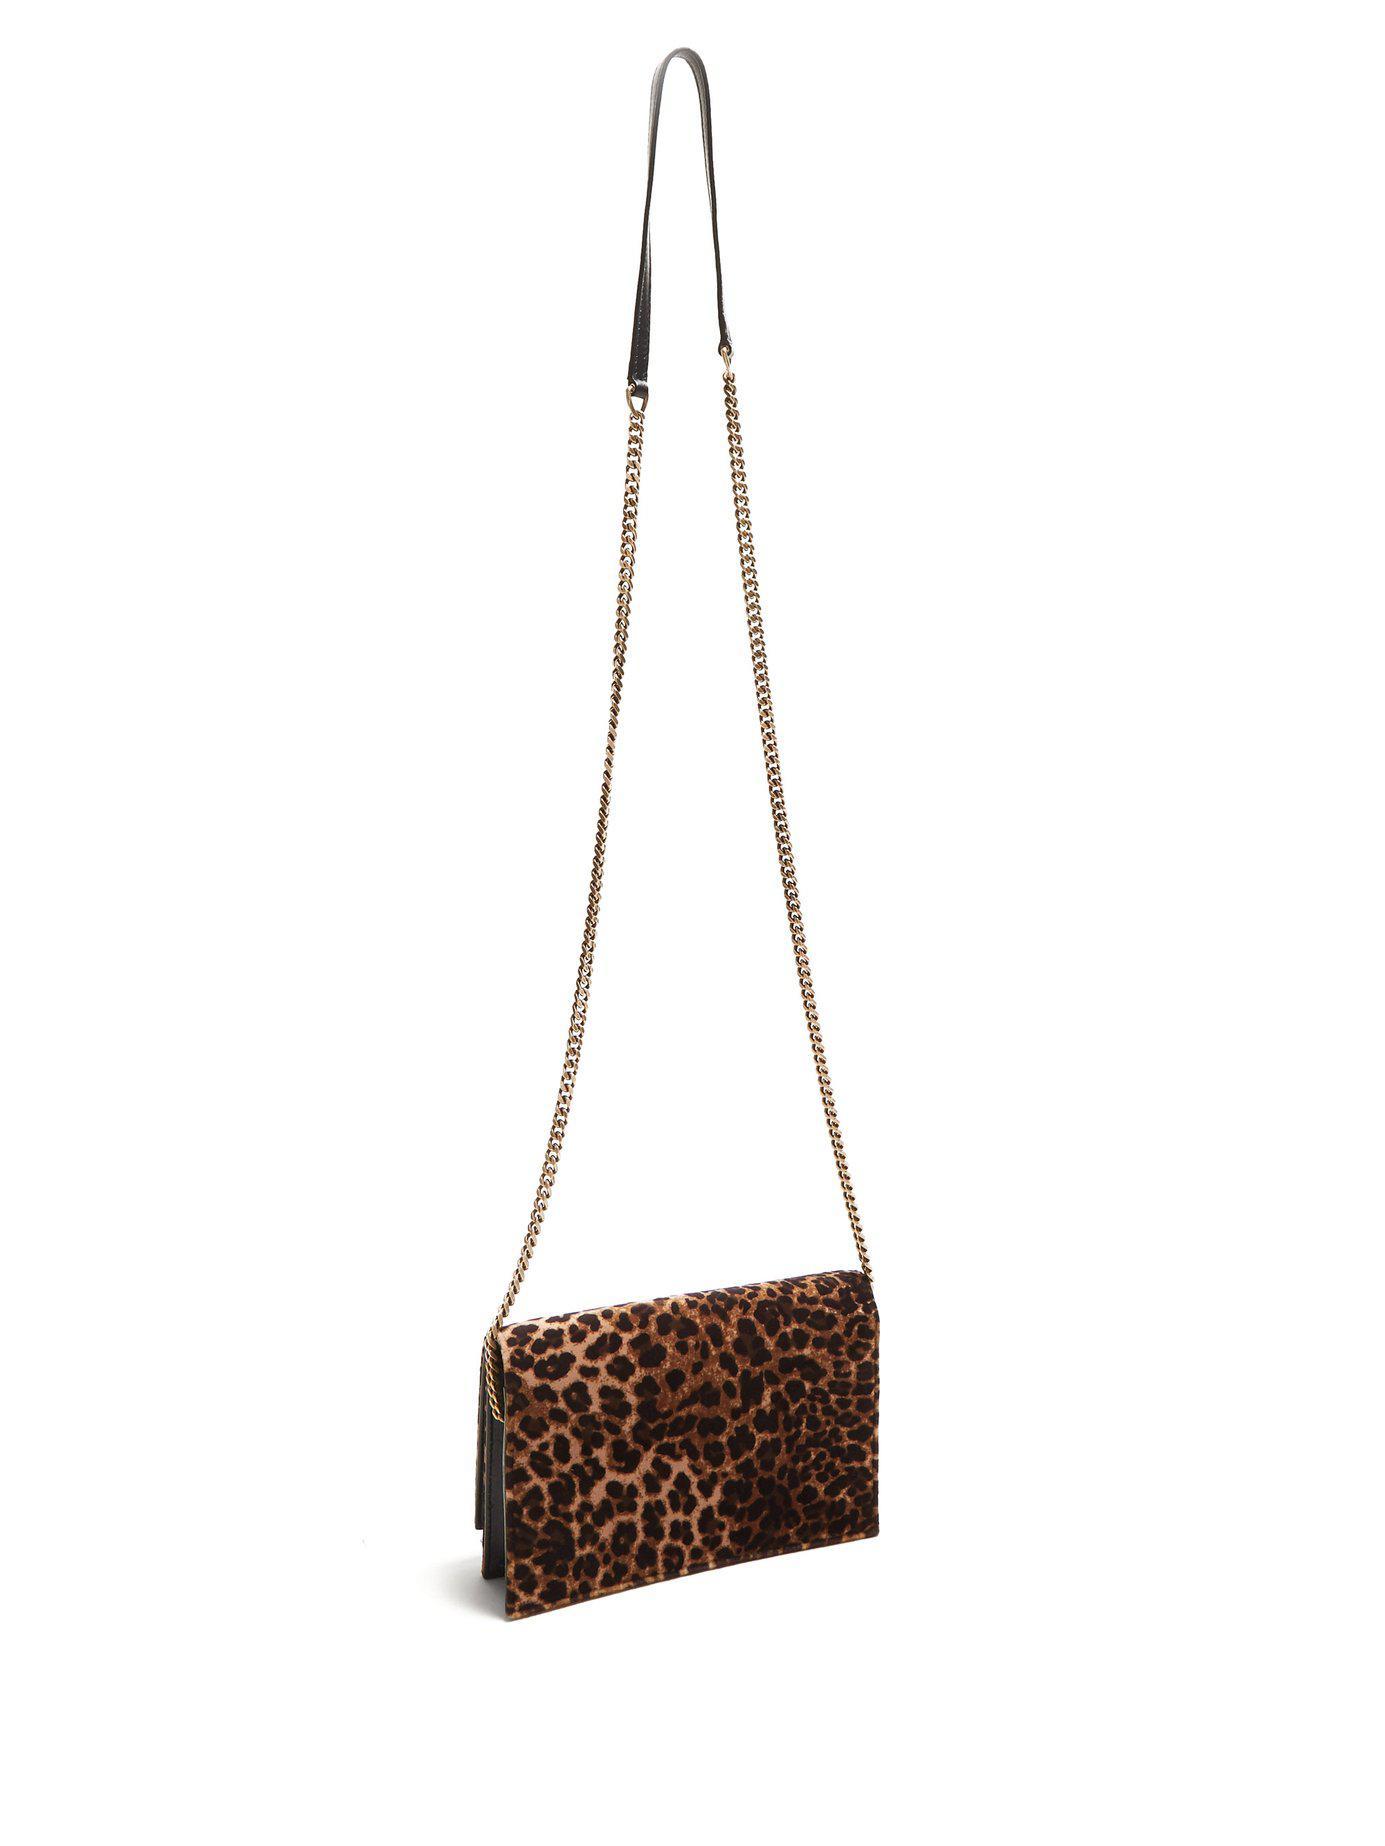 6d46a0d59183 Saint Laurent - Brown Kate Small Leopard Print Velvet Cross Body Bag - Lyst